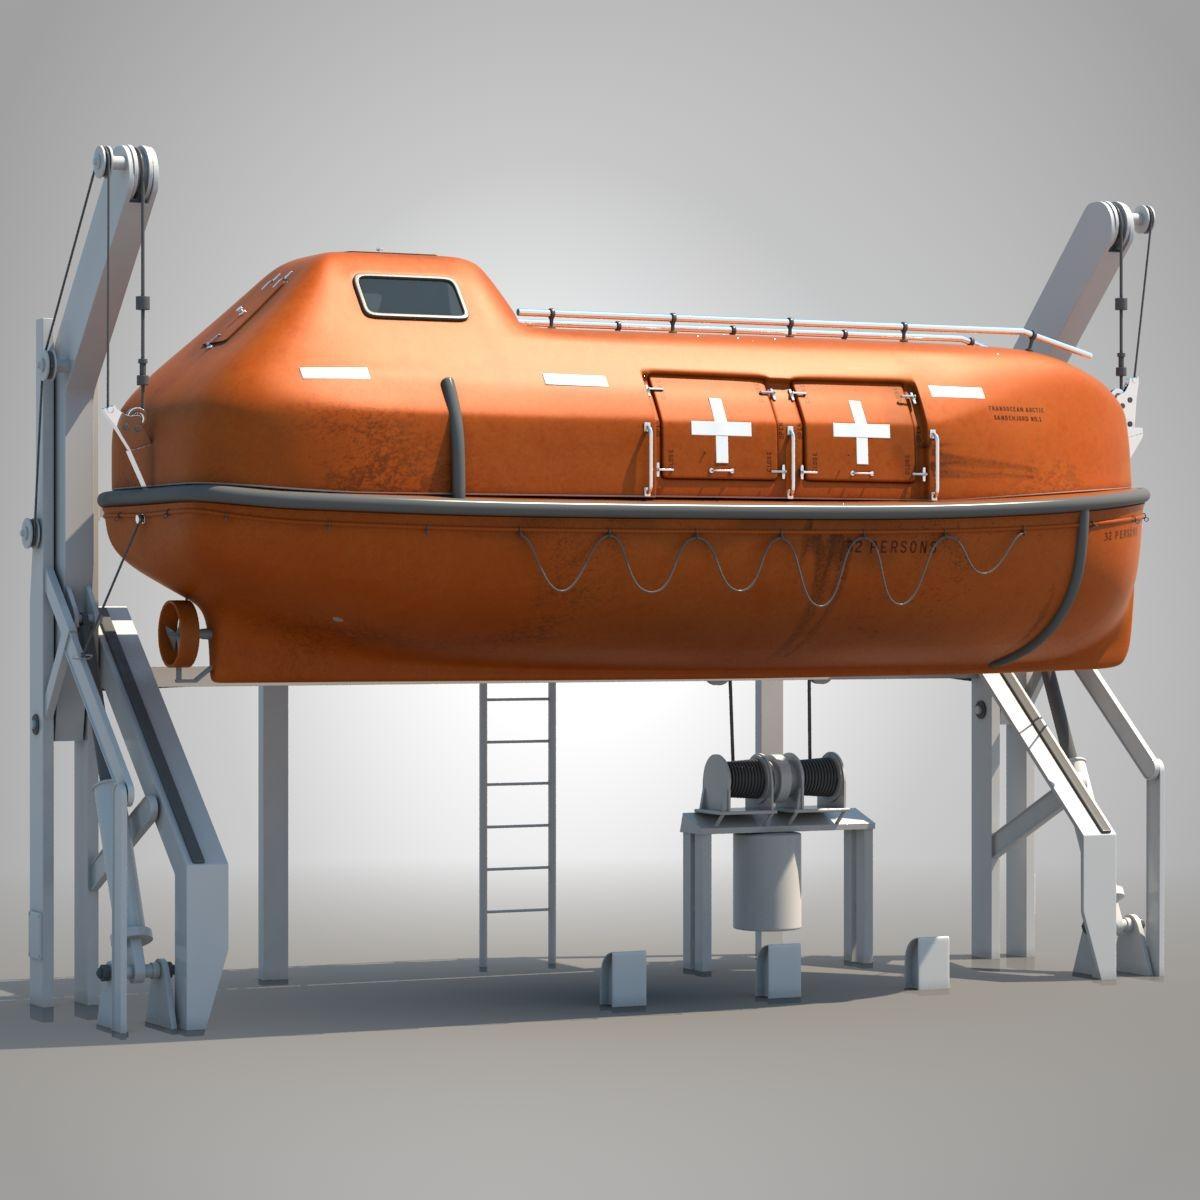 lifeboat_001.jpg